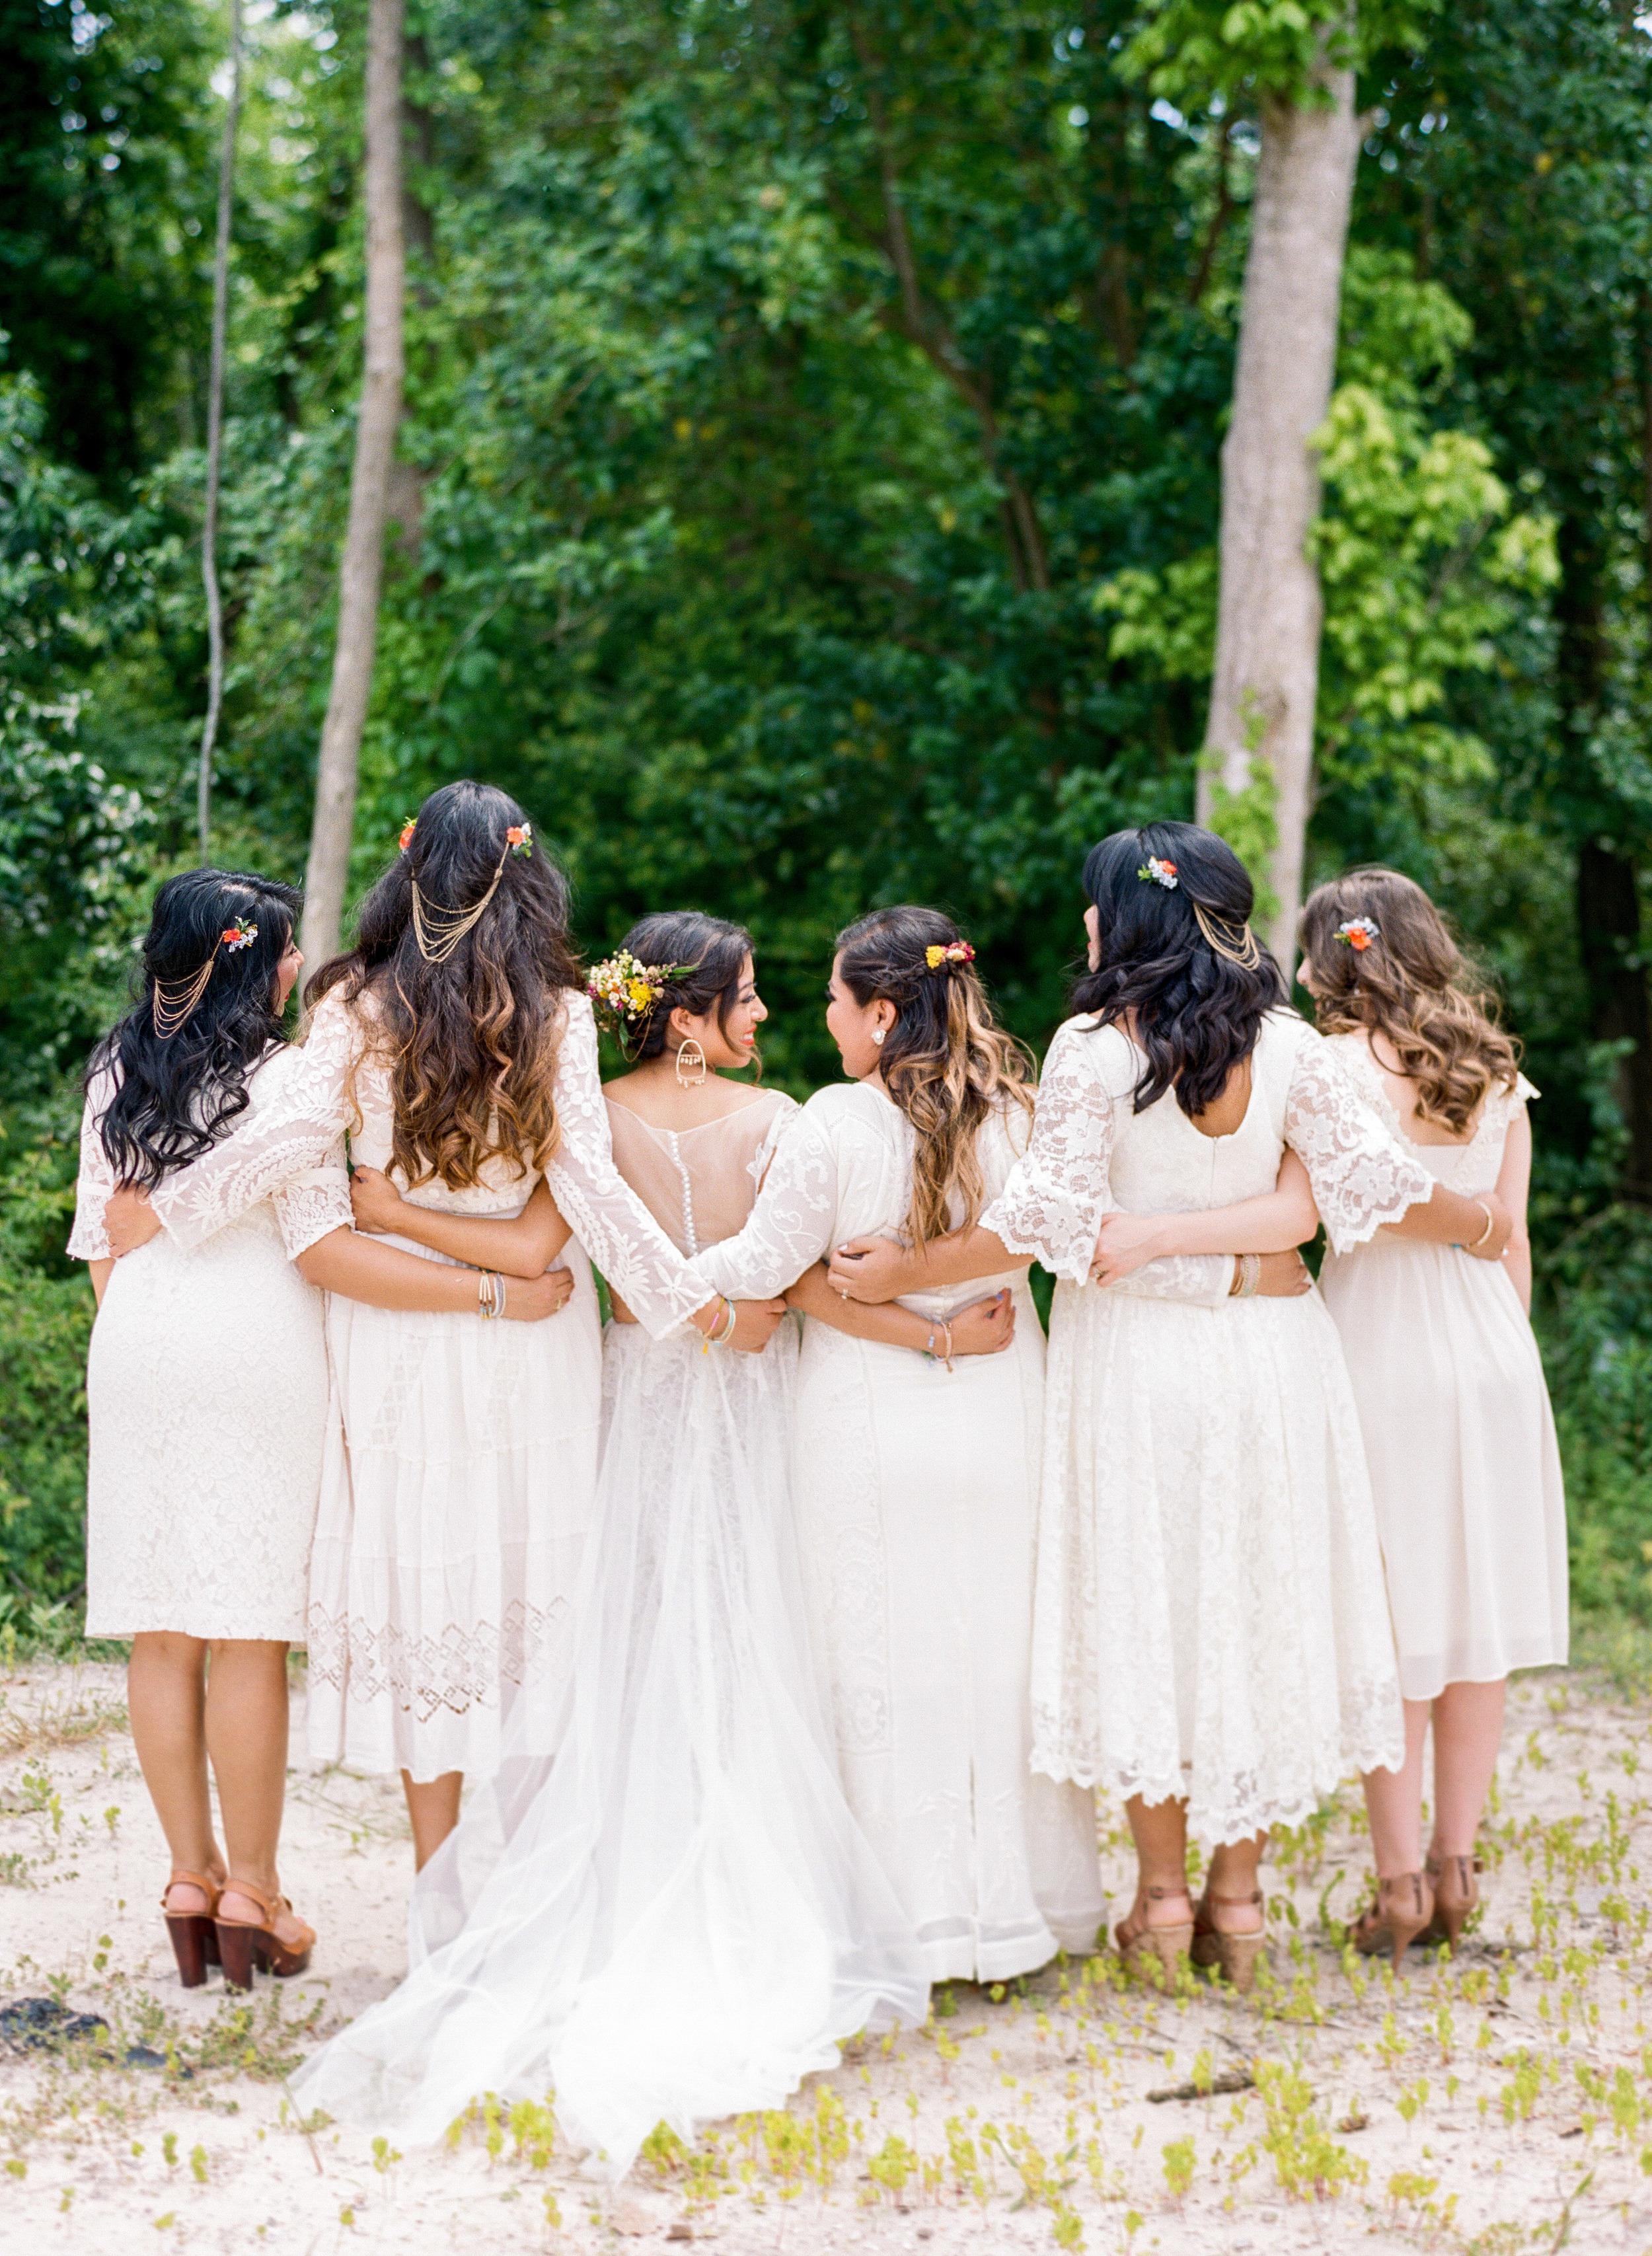 Dana-Fernandez-Photography-Martha-Stewart-Weddings-Houston-Texas-Wedding-Photographer-Film-9.jpg